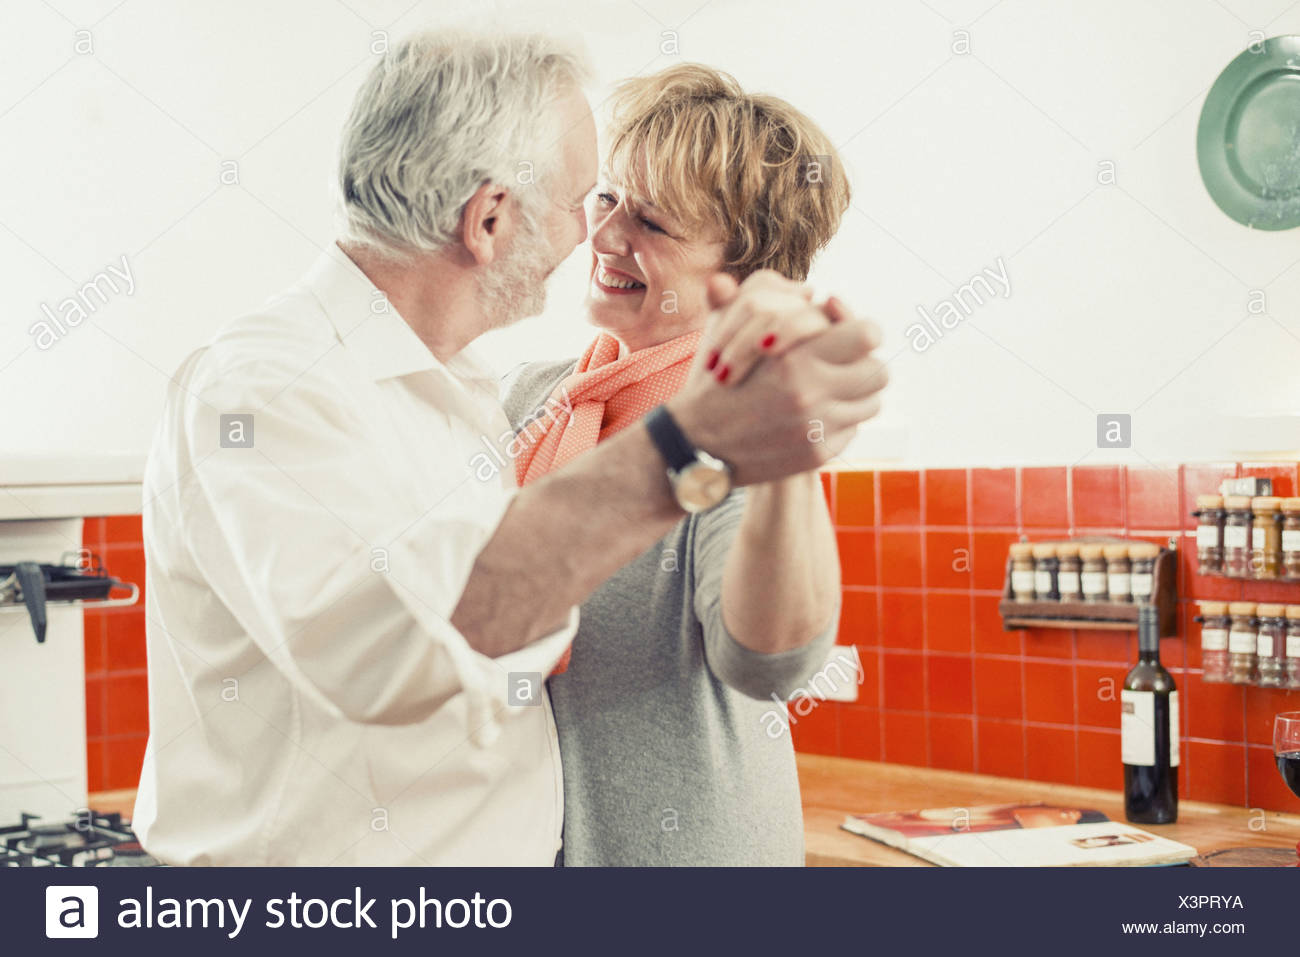 Paare tanzen in Küche Stockbild